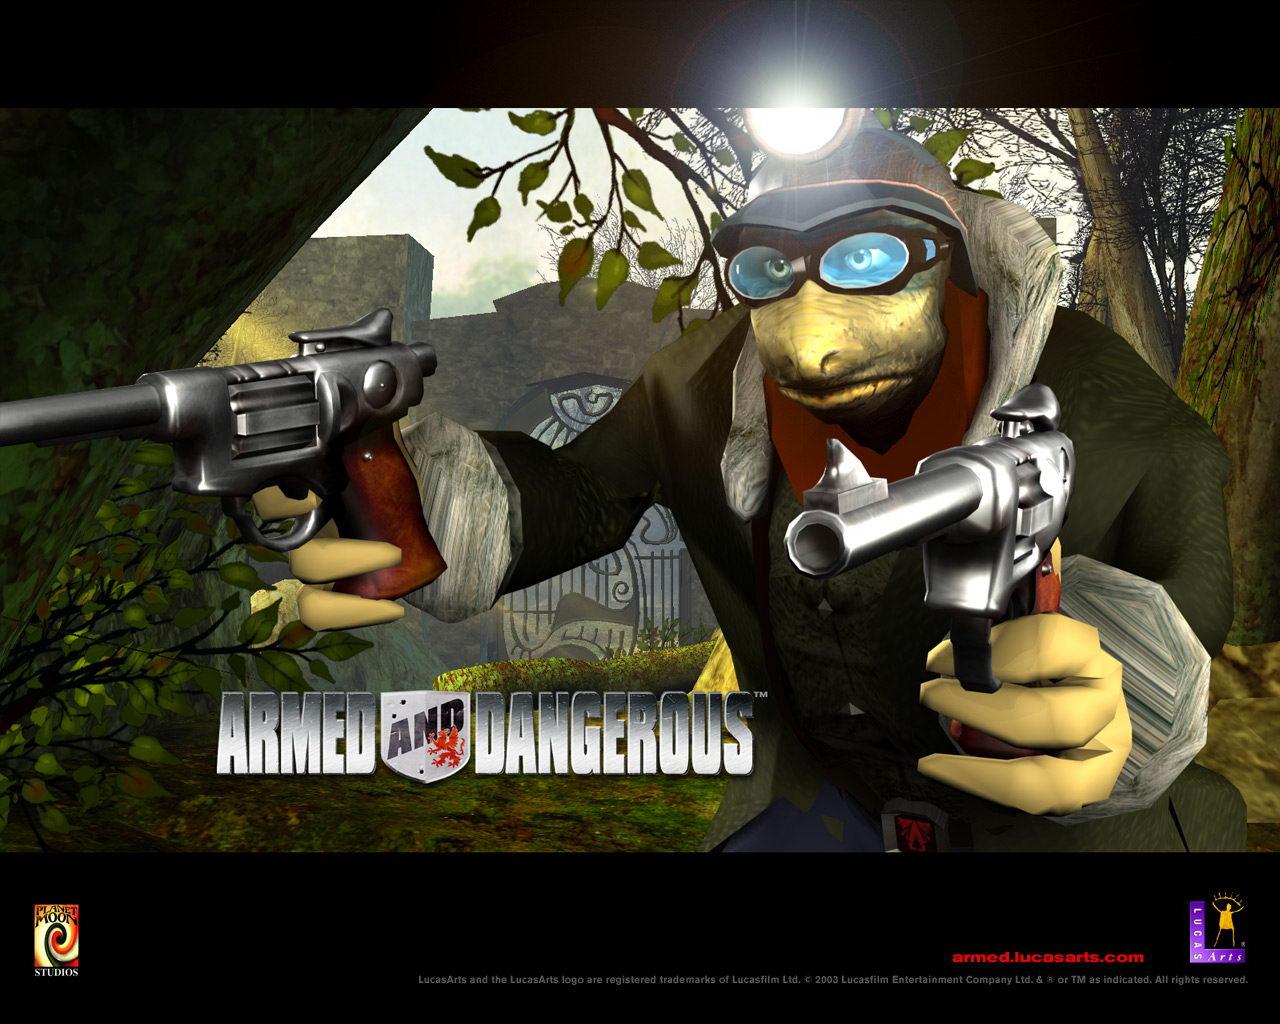 http://4.bp.blogspot.com/-Dbf80a30y_w/Tf-qYlSQrhI/AAAAAAAABiU/__vD0ENKjOE/s1600/Armed+and+Dangerous+jonesy.jpg